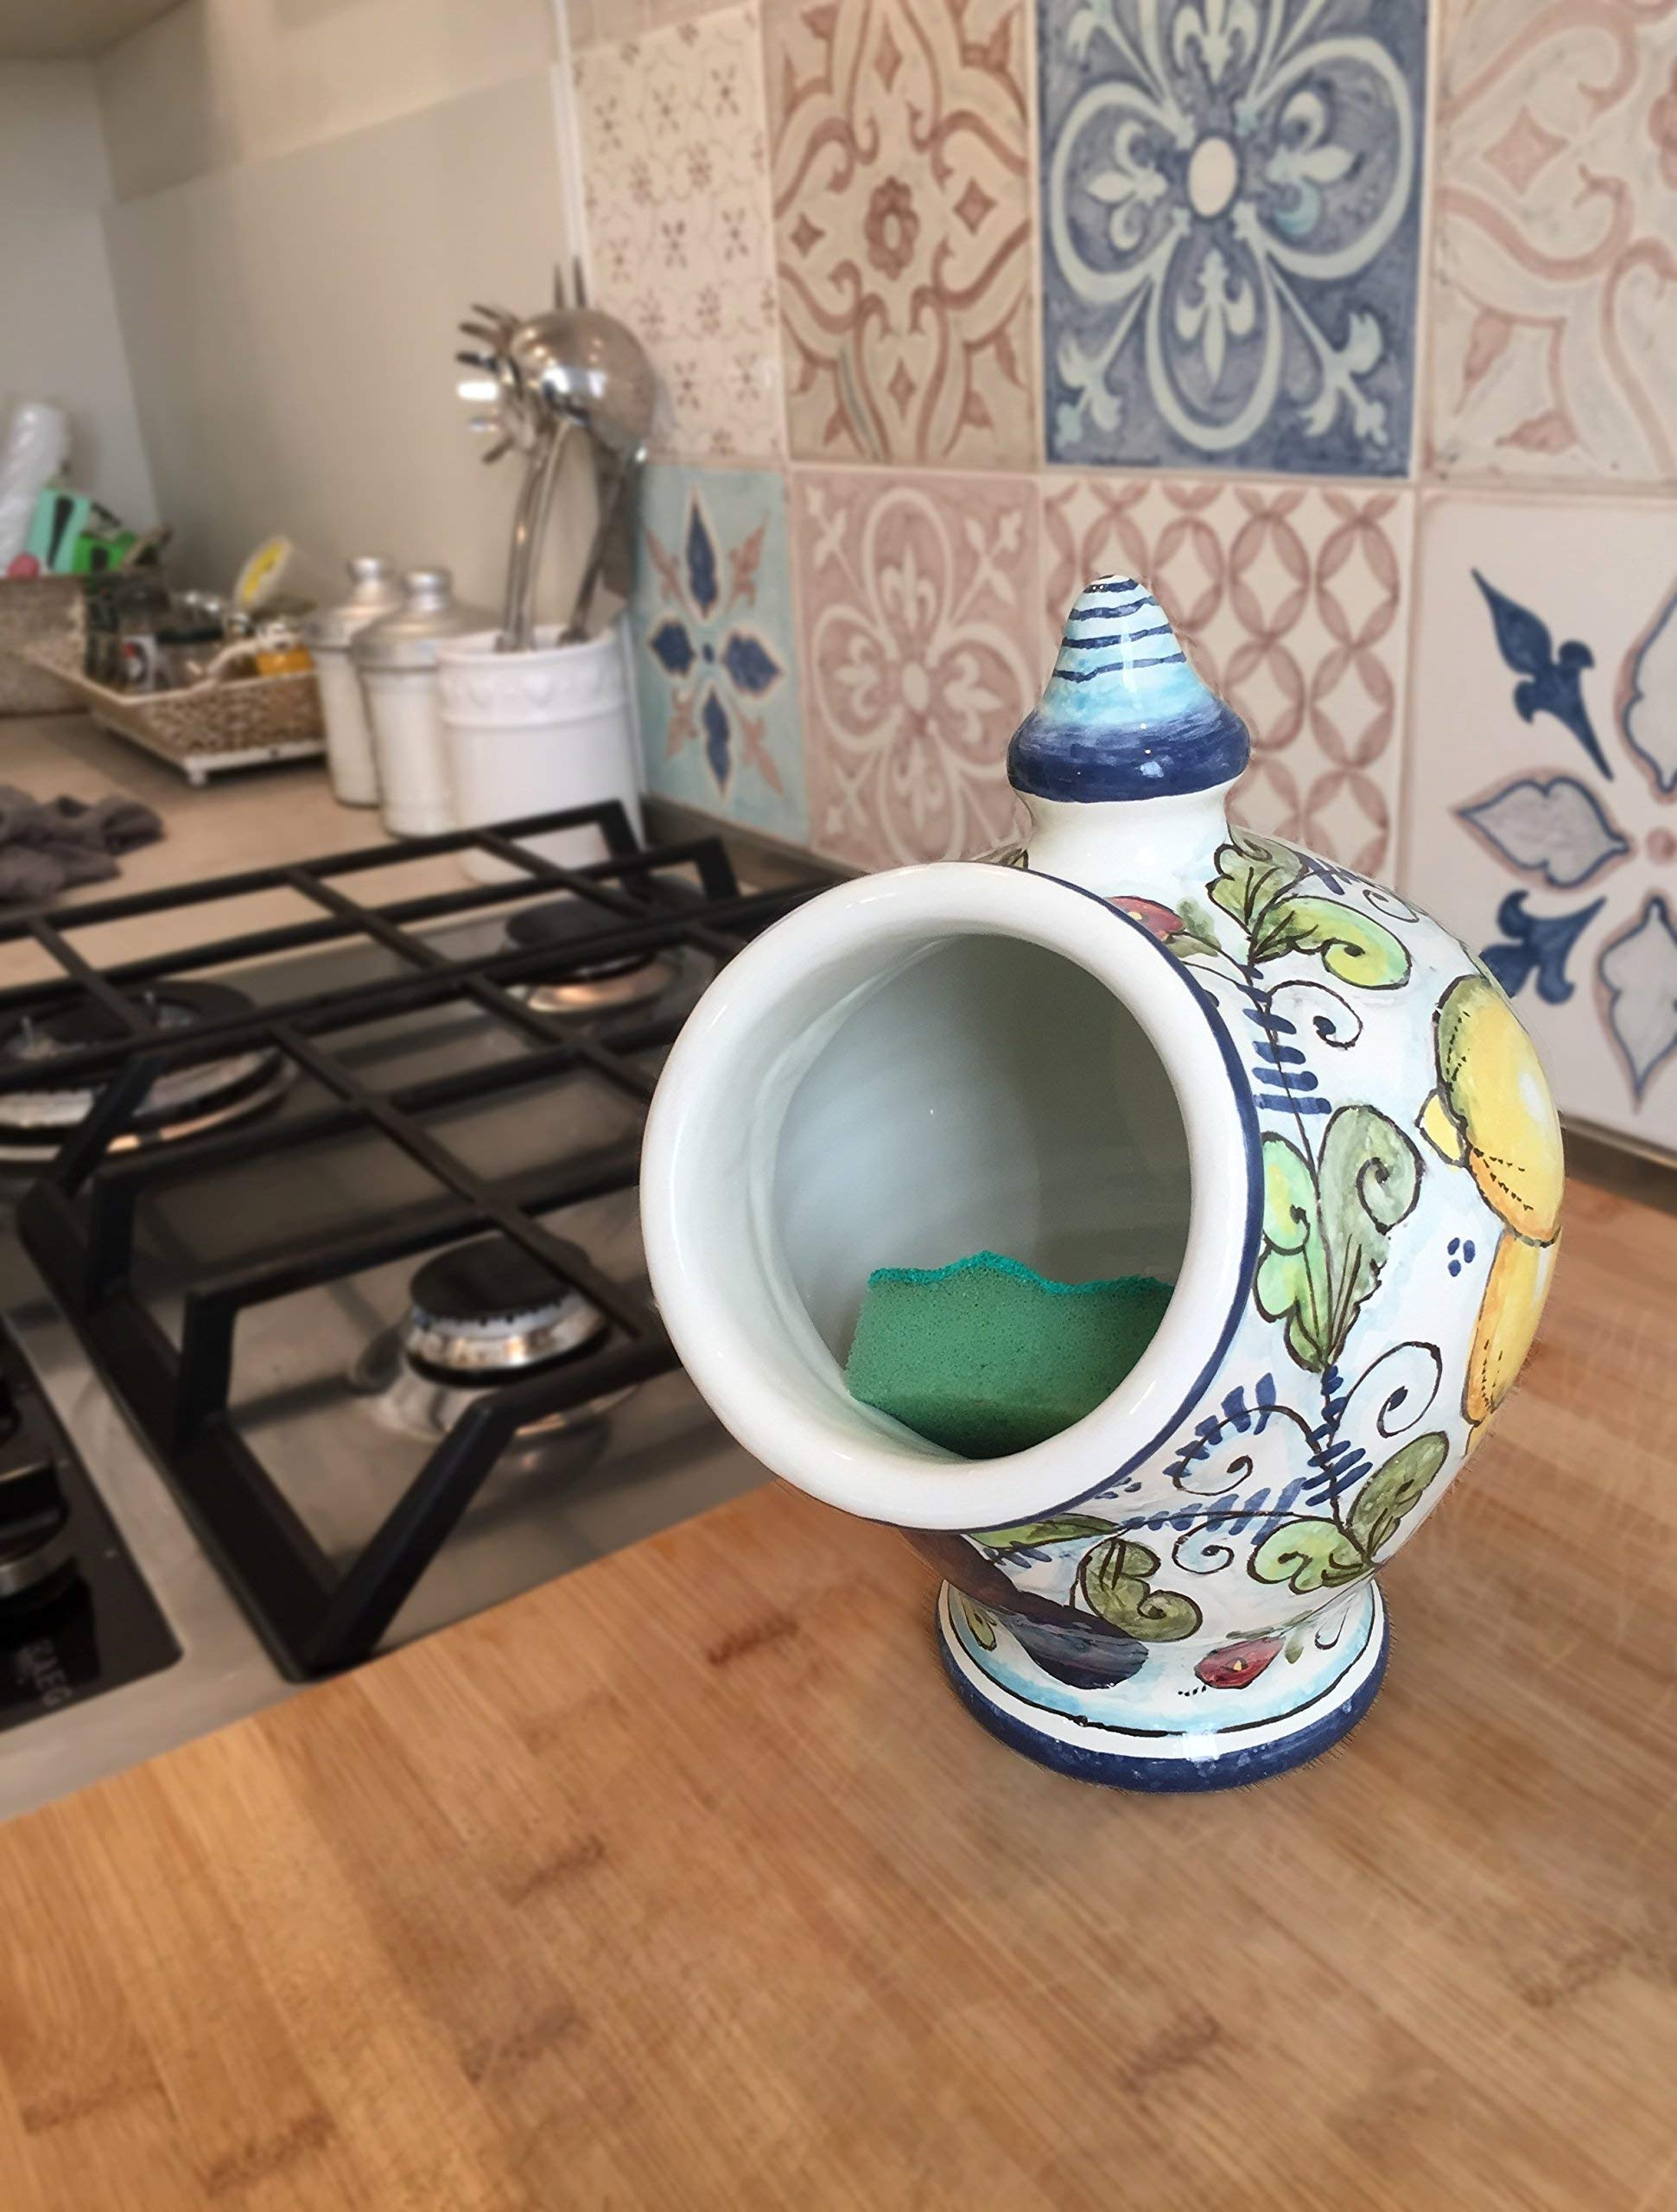 CERAMICHE D'ARTE PARRINI- Italian Ceramic Jar Salt Holder Sponge Hand Painted Decorated Fruit Made in ITALY Tuscan Art Pottery by CERAMICHE D'ARTE PARRINI since 1979 (Image #4)